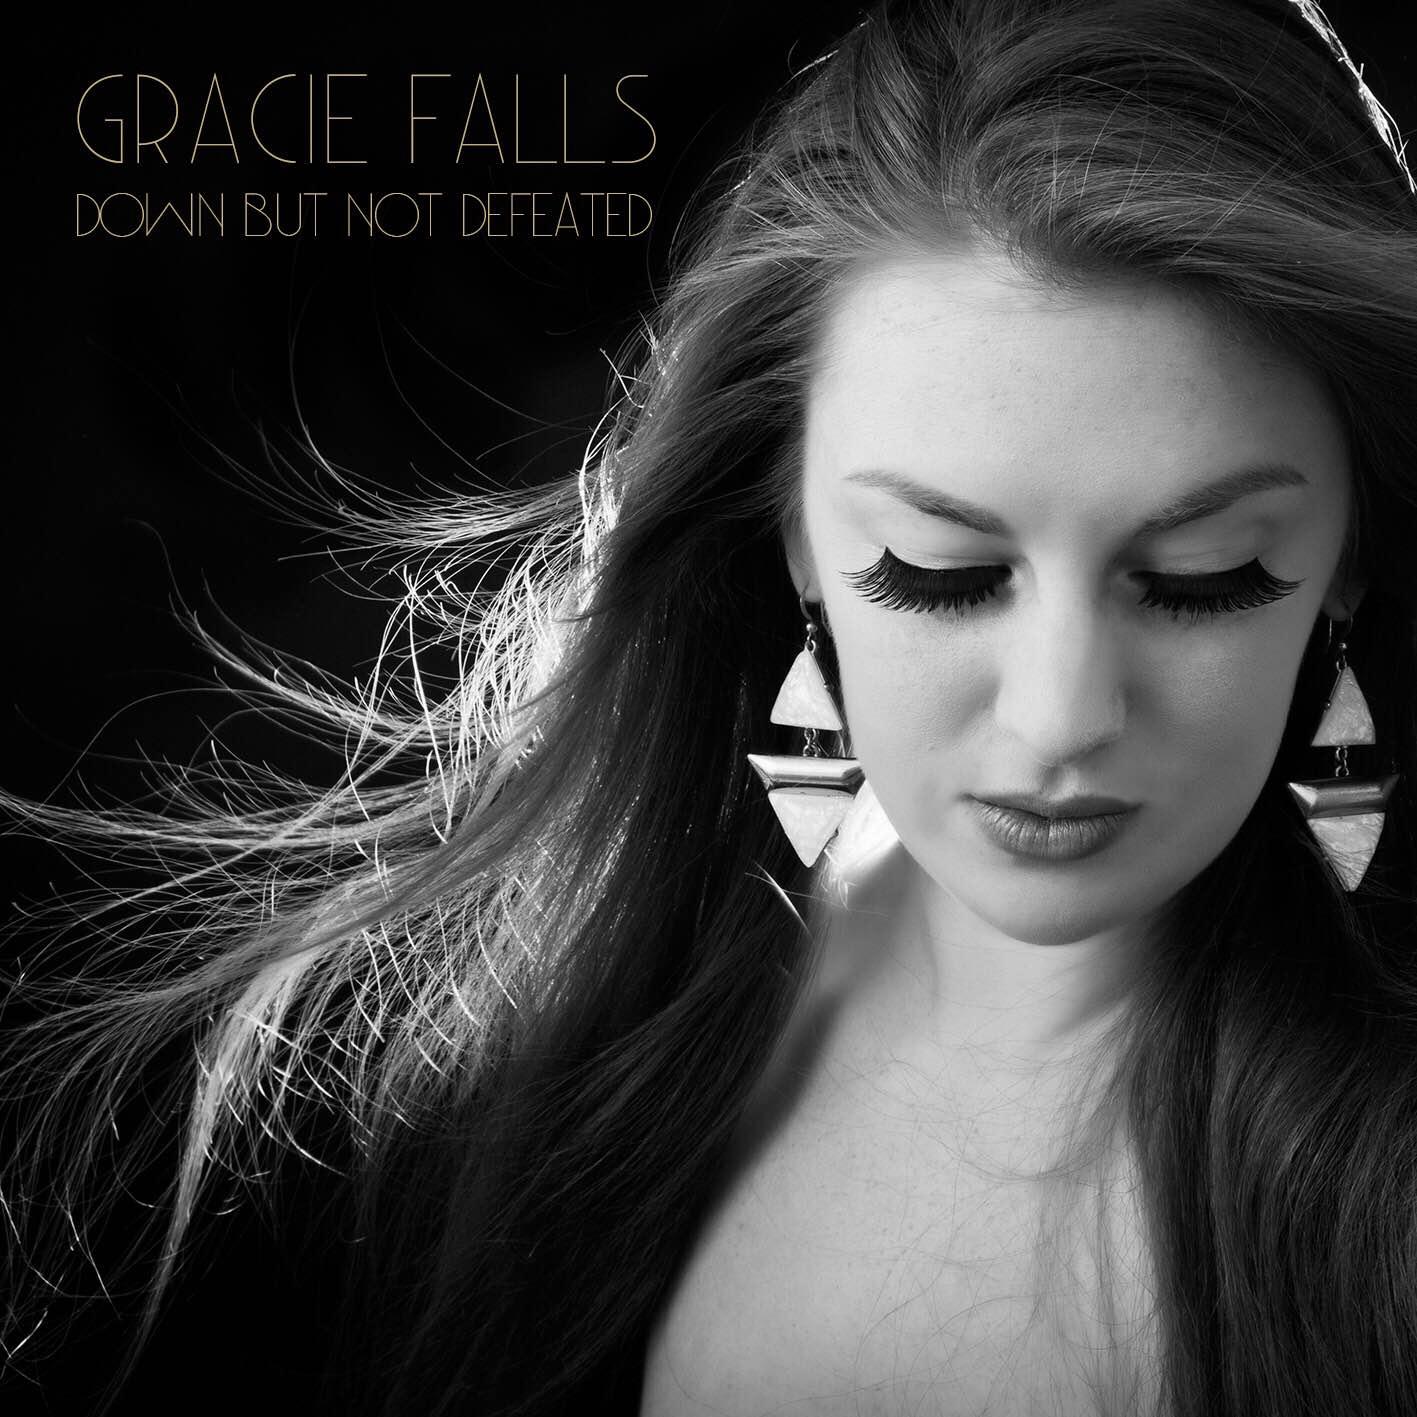 Gracie Falls